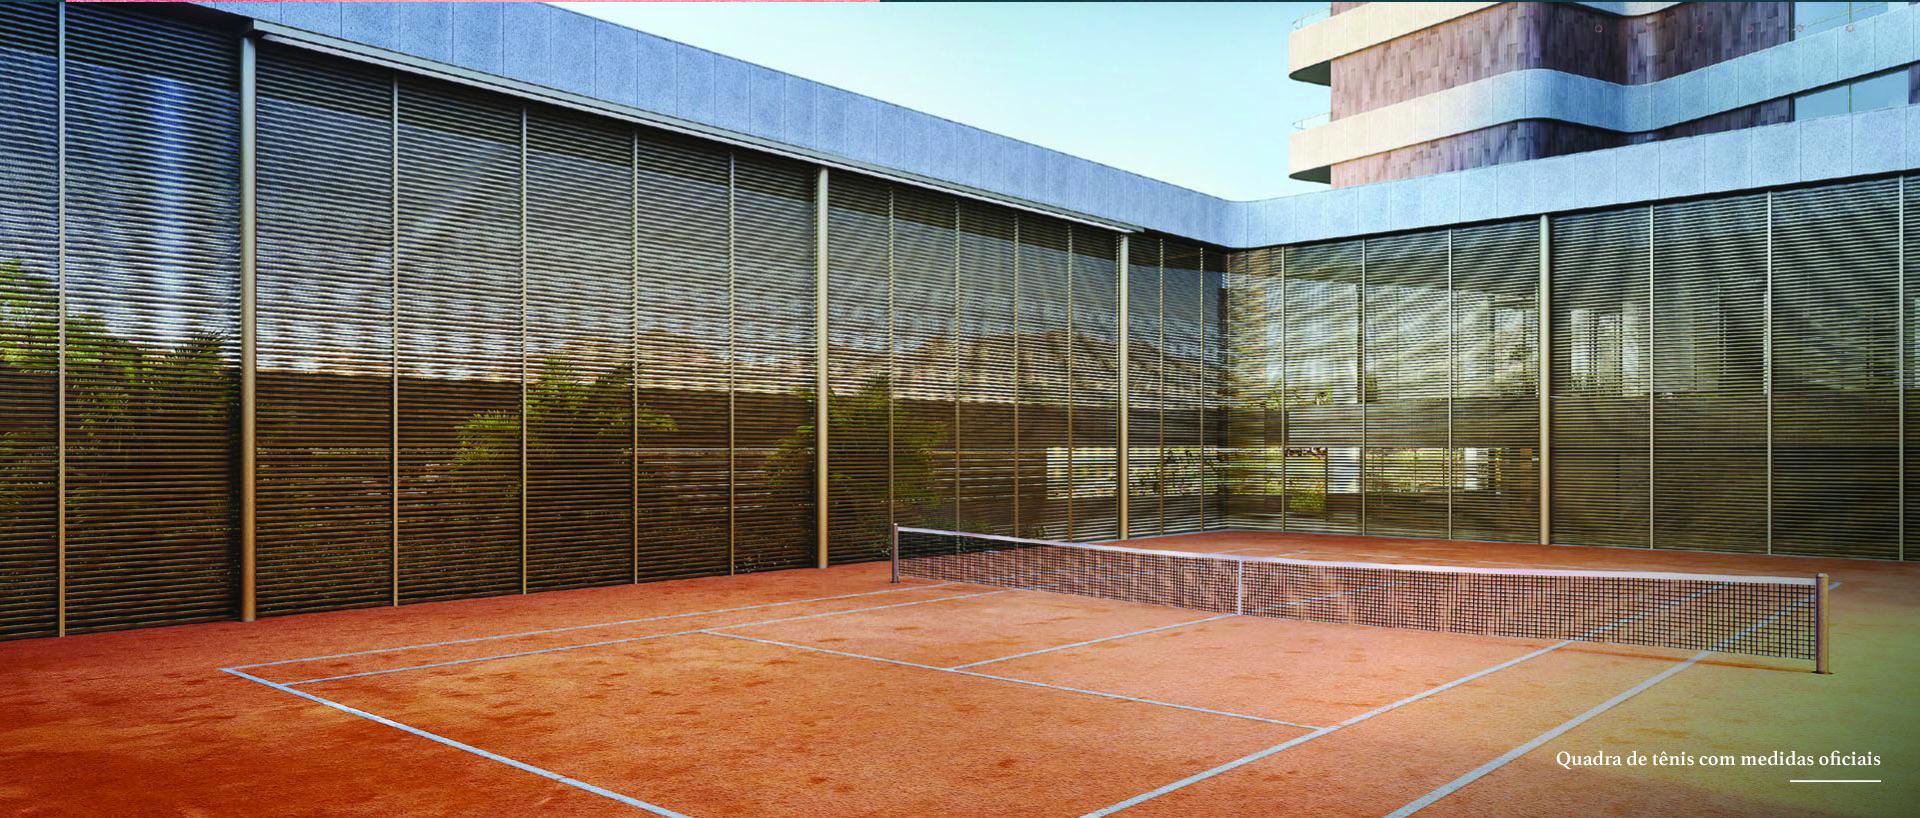 quadra de tenis Brisa vale do sereno